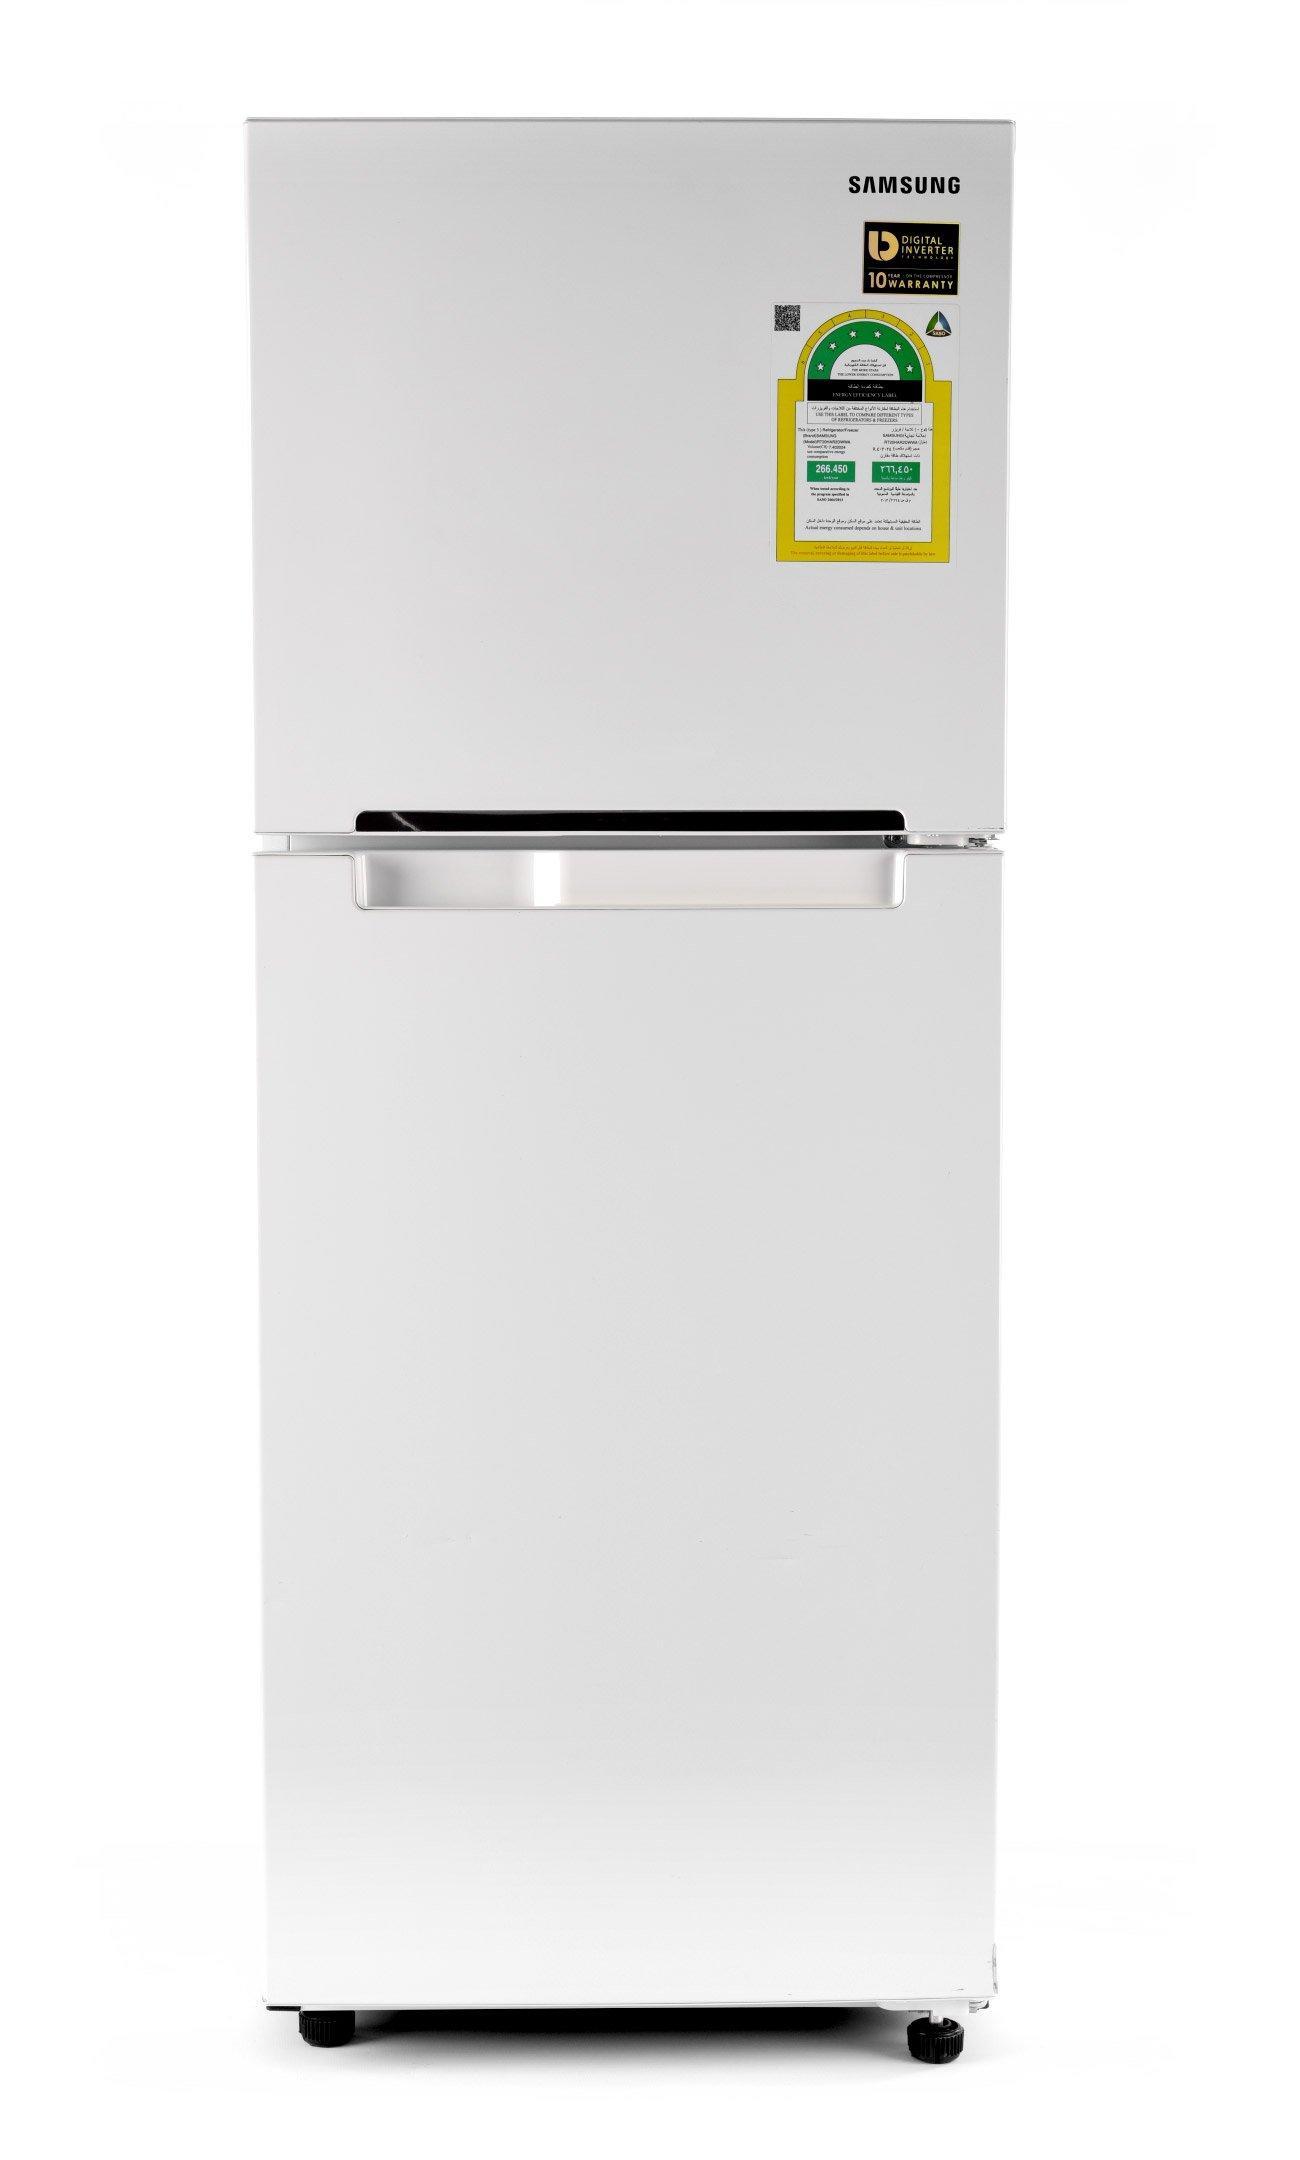 Refrigerators – Best deals and Prices on Refrigerators - eXtra Saudi